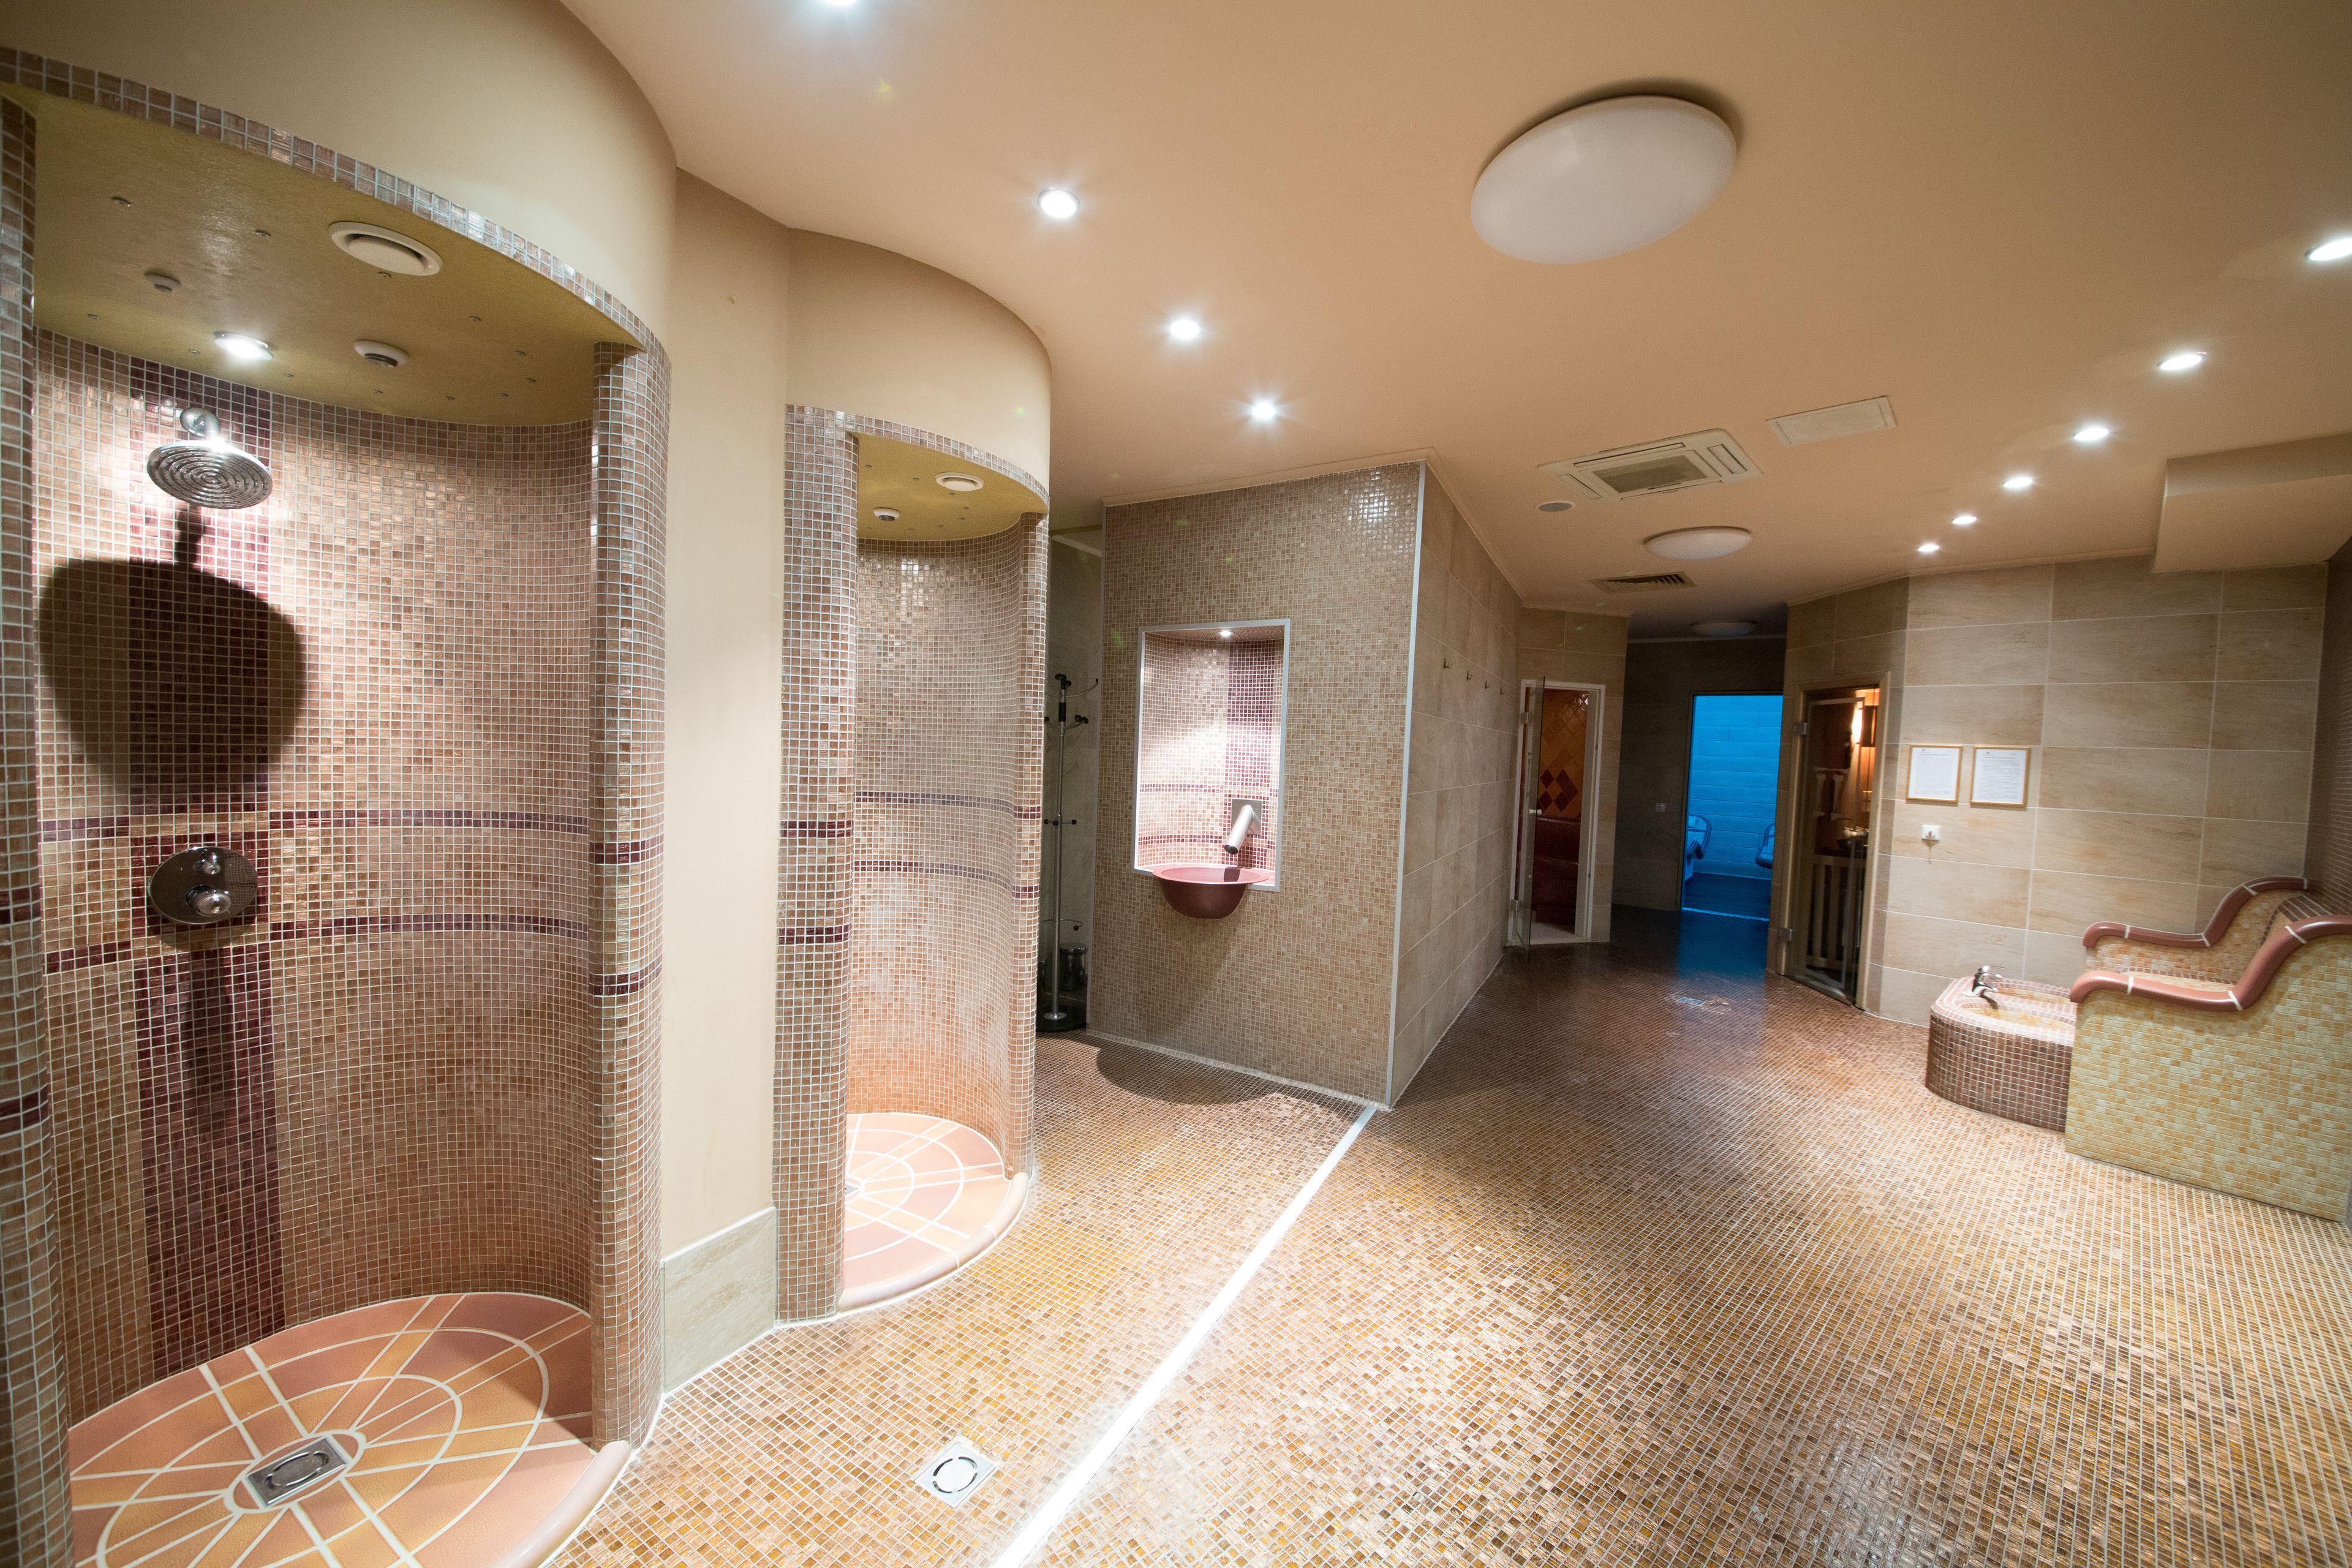 Courtesy of Rosslyn Dimyat Hotel Varna / Expedia